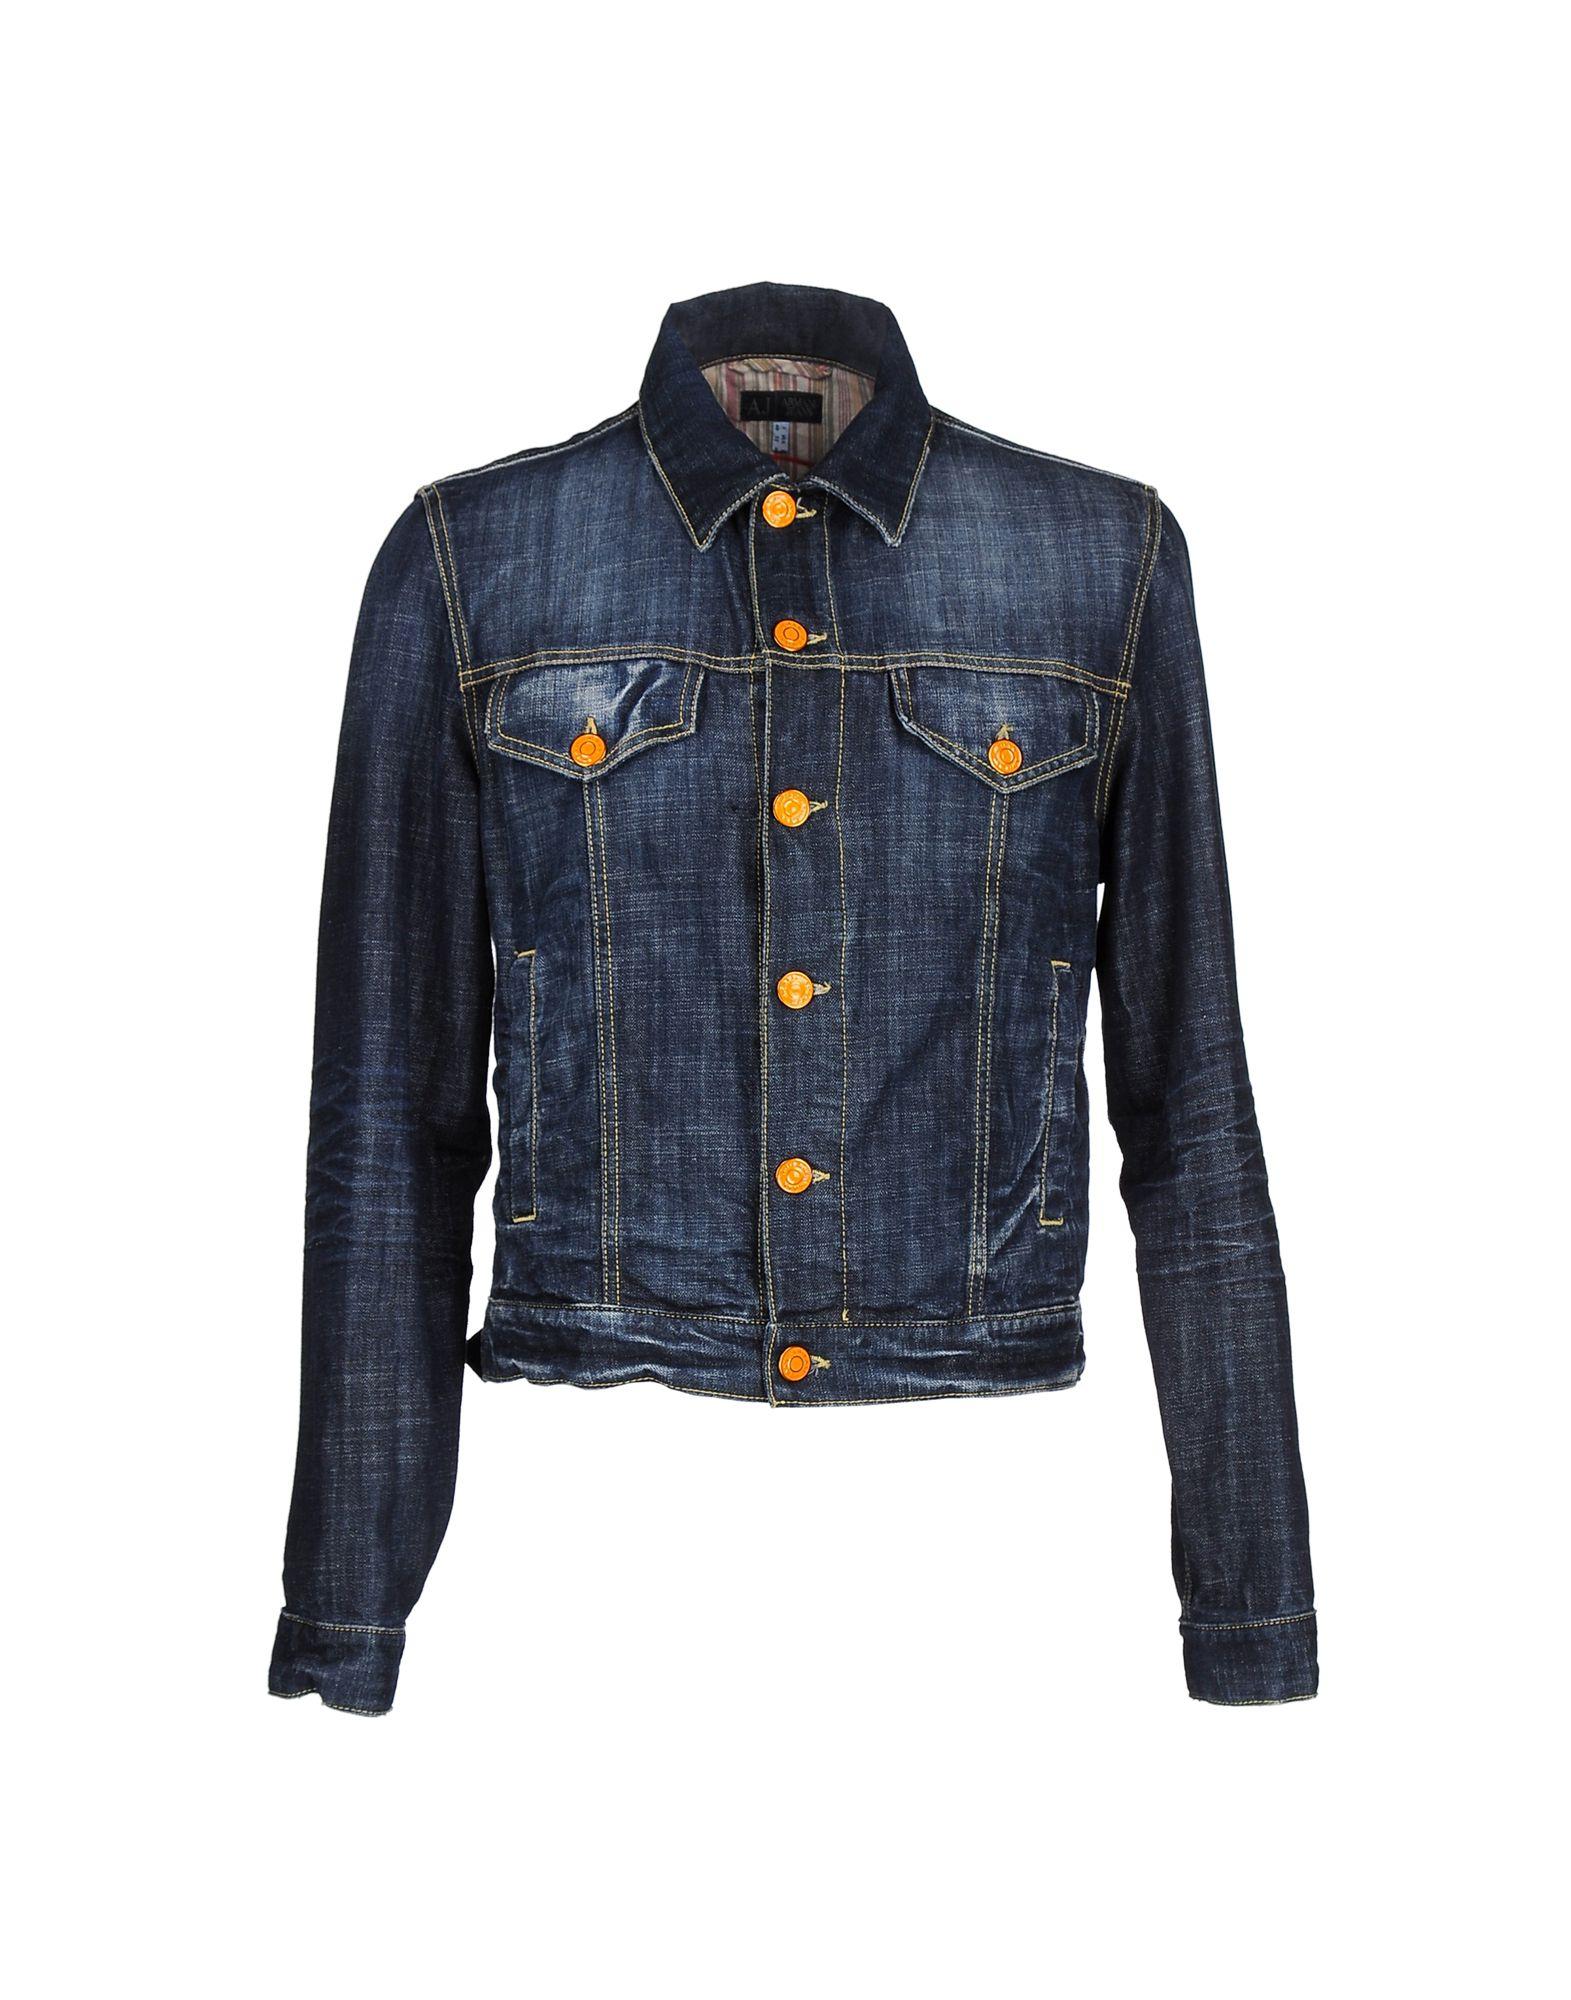 Фото - ARMANI JEANS Джинсовая верхняя одежда armani jeans верхняя одежда из кожи